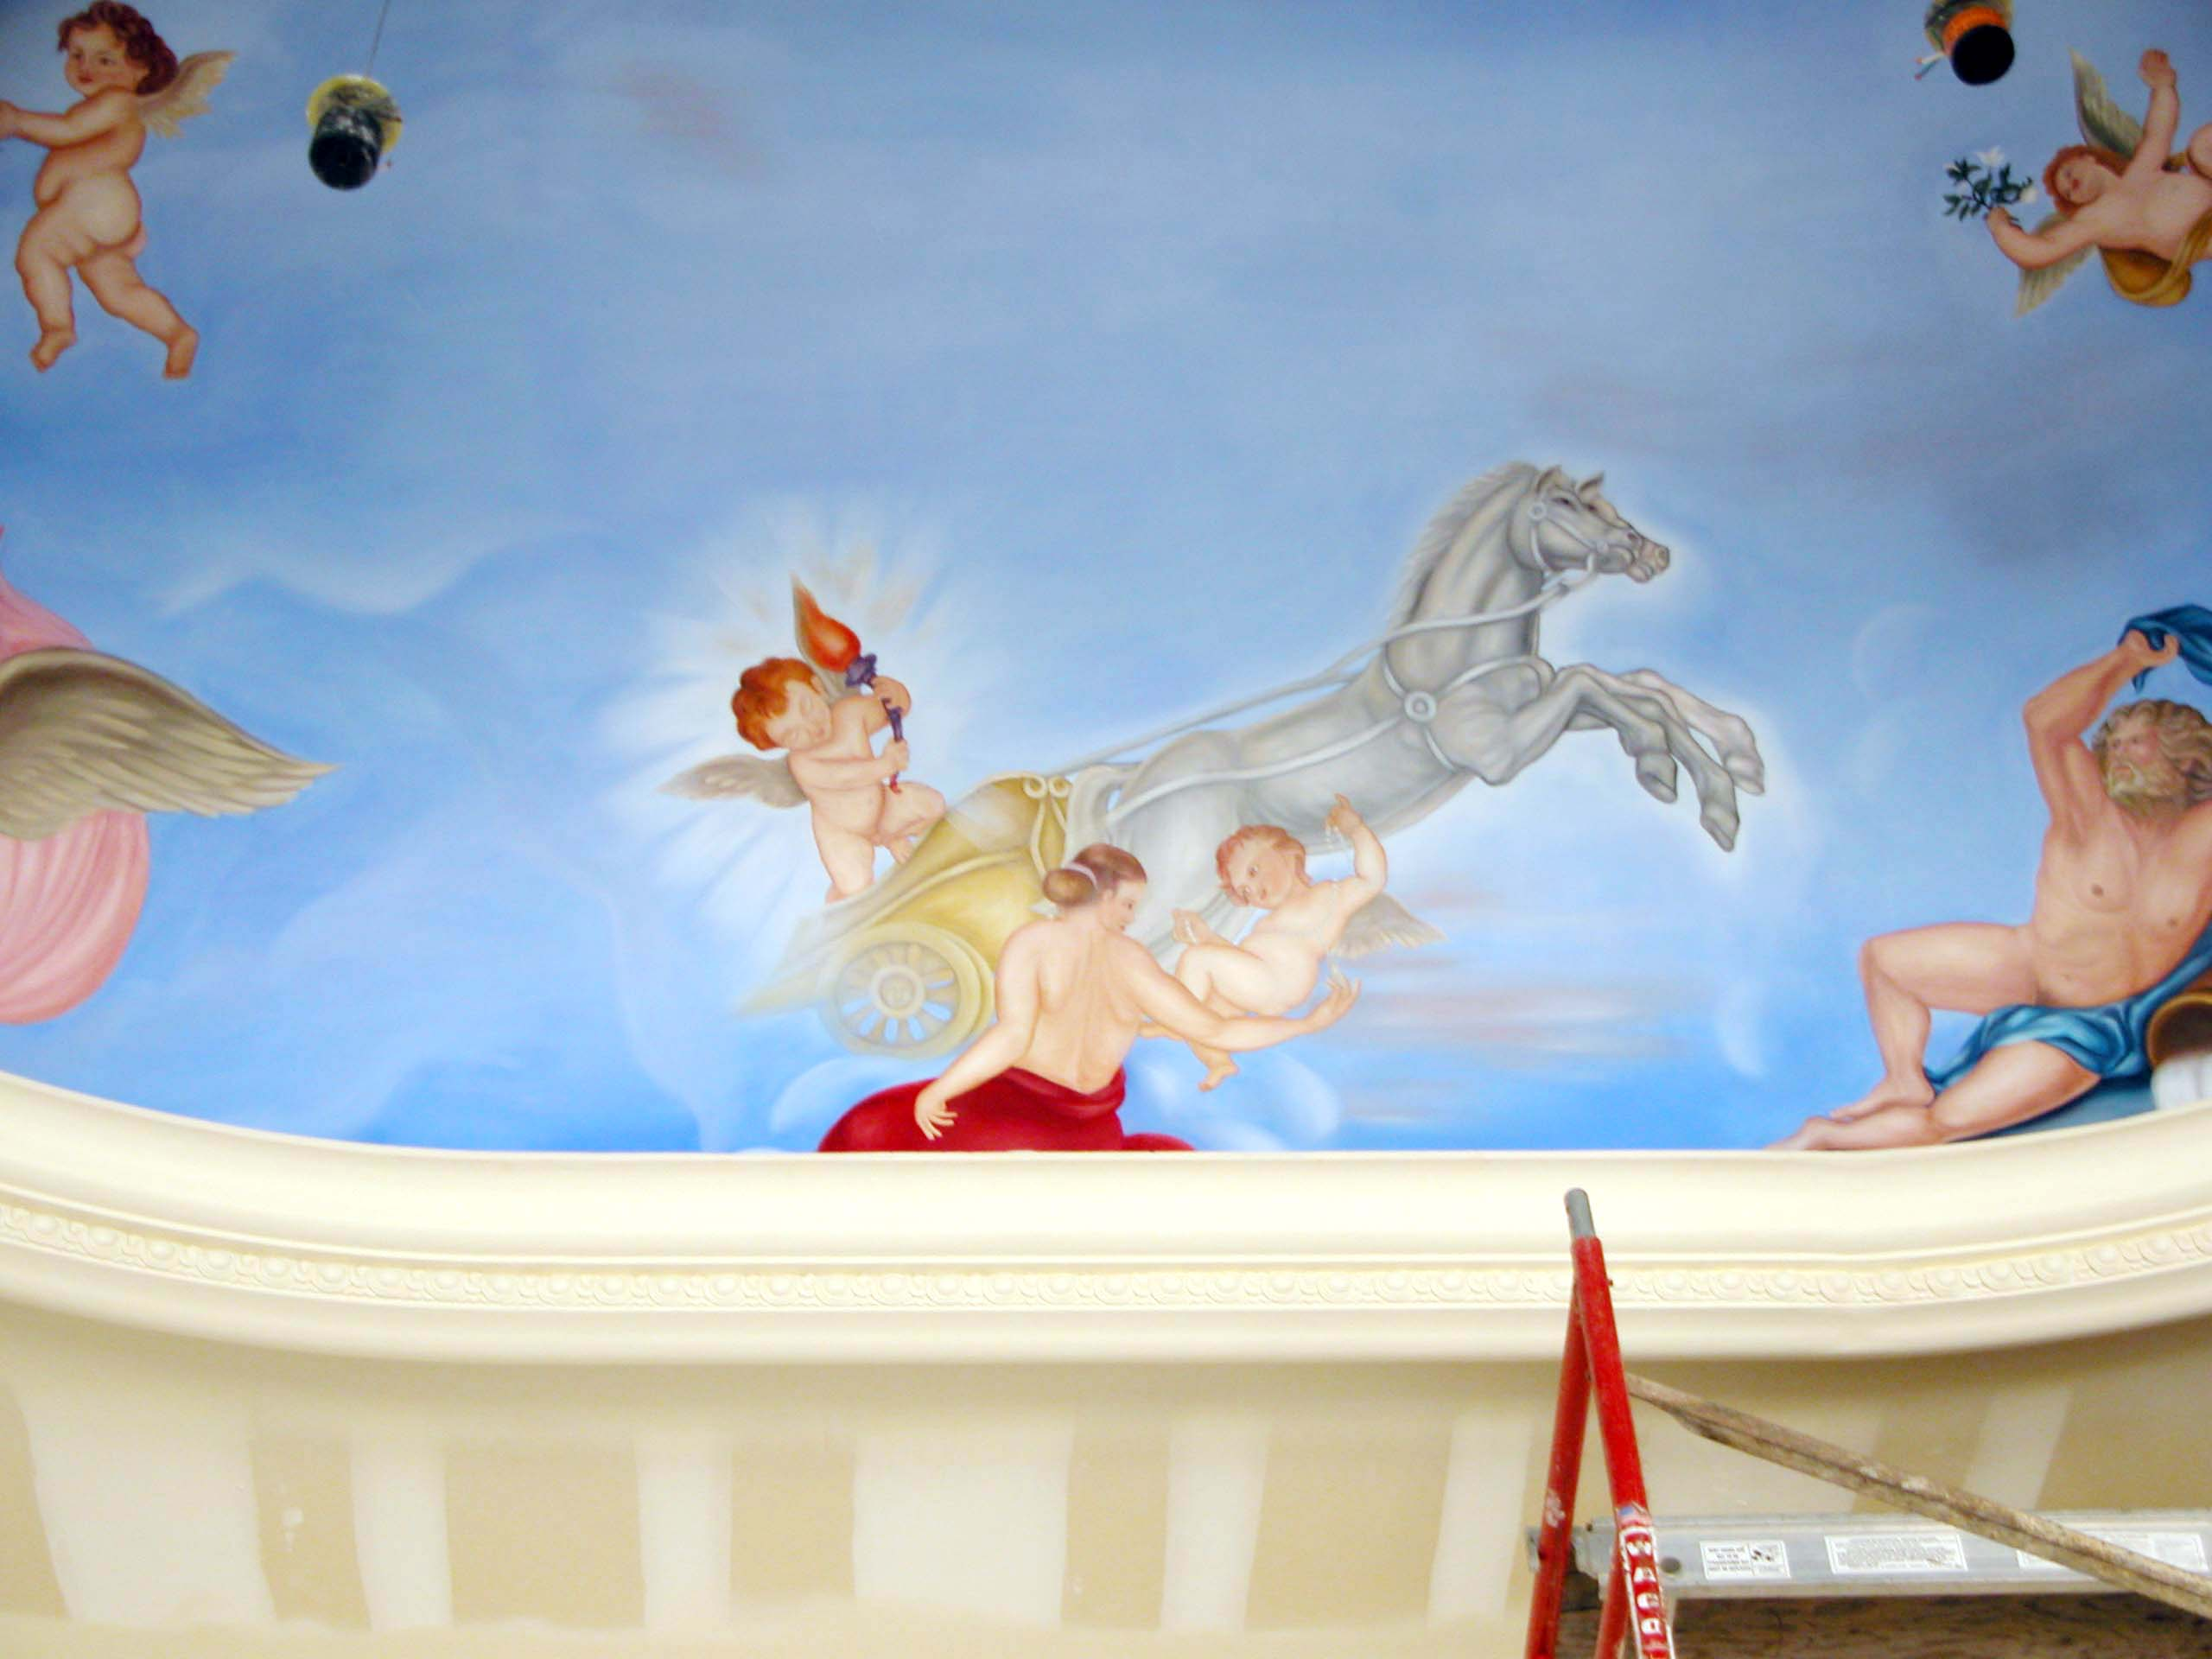 Mural Norwood NJ